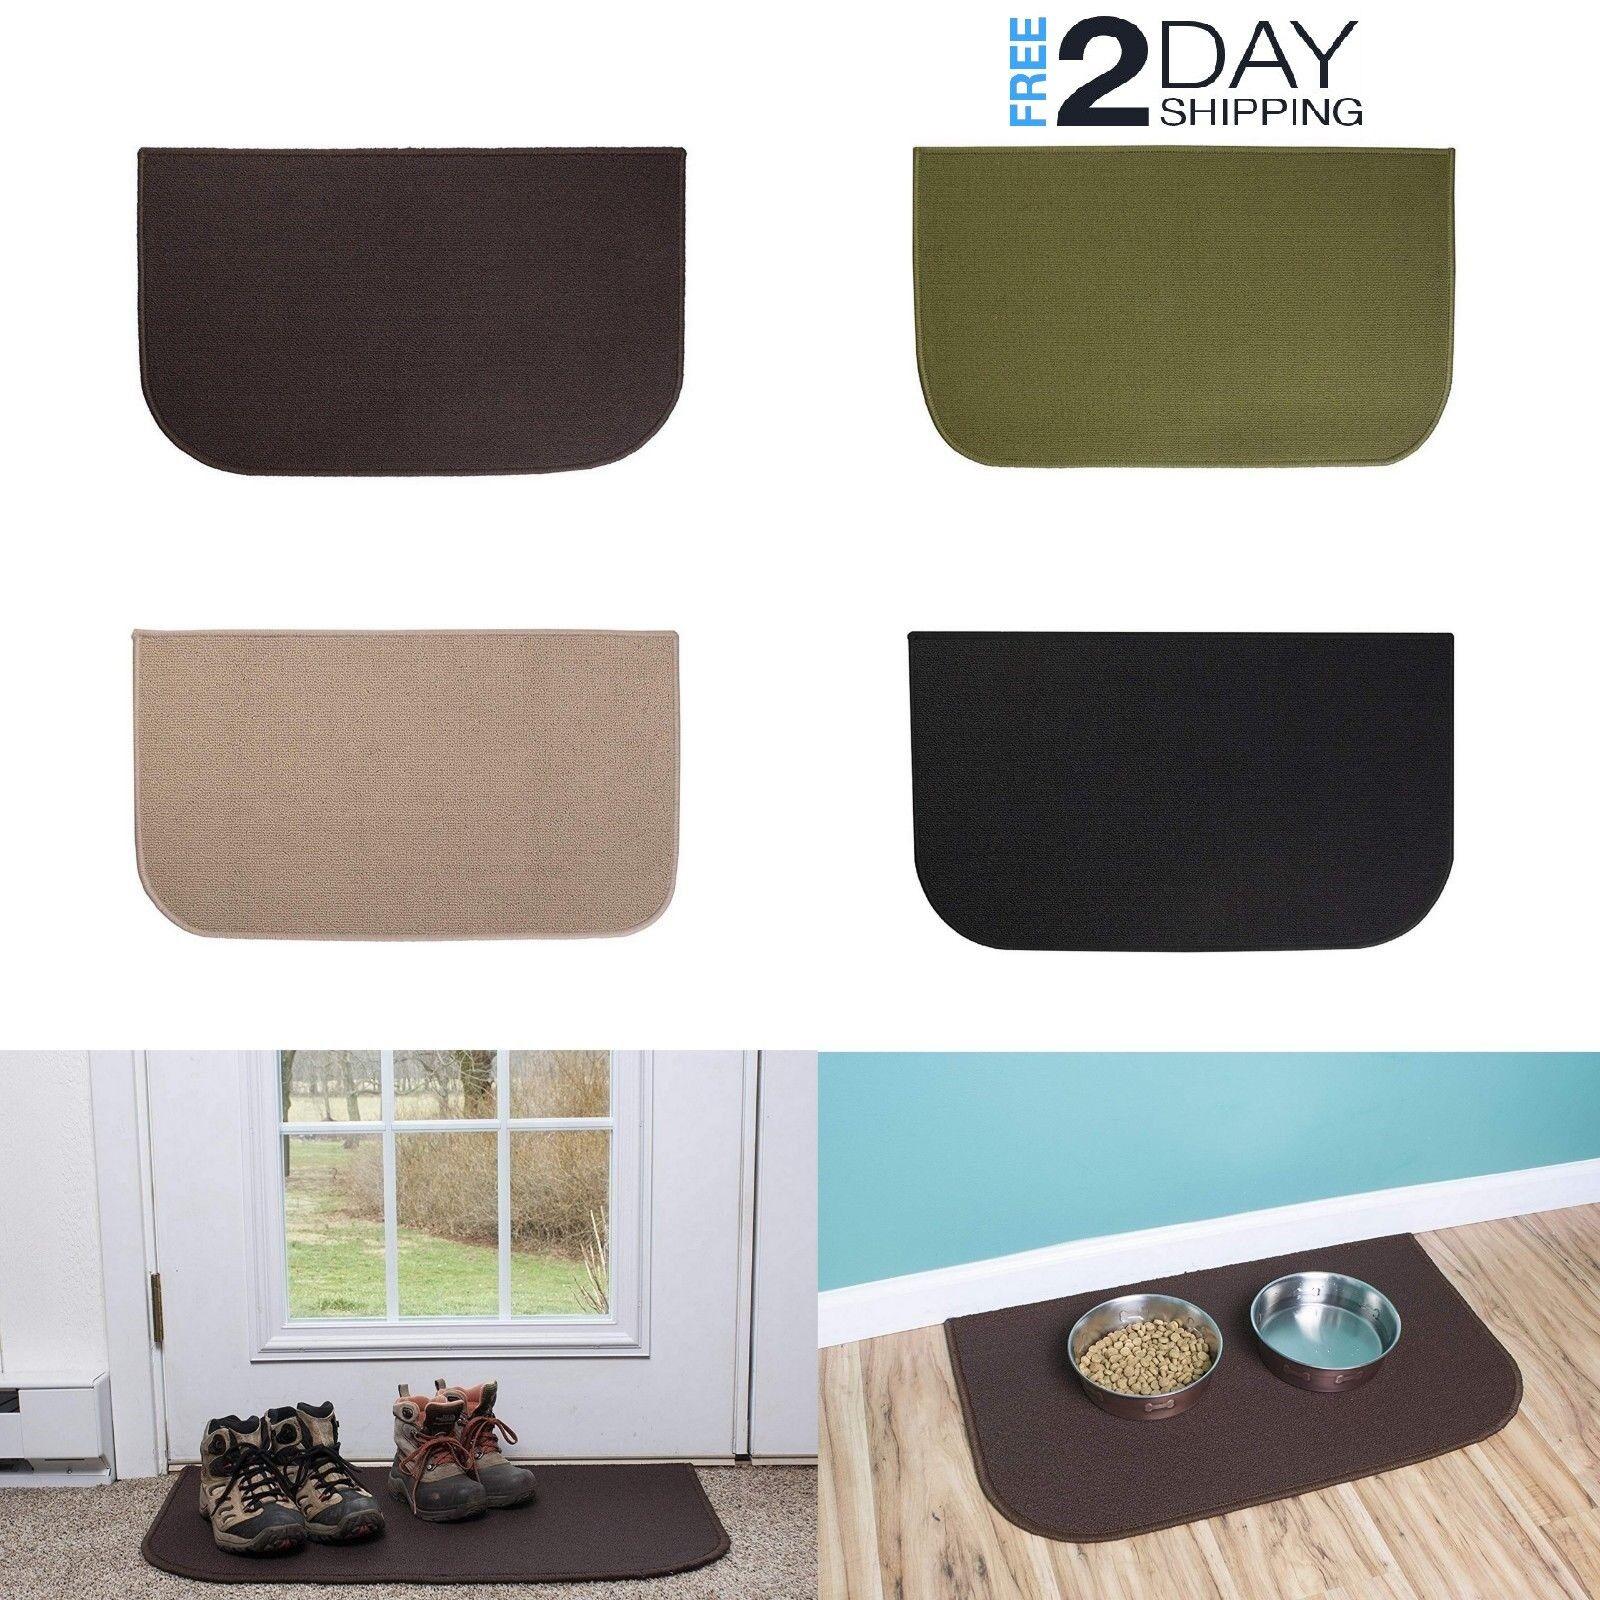 Door Area Mat Carpet Non Slip 18x30 Stain Resistant Accent K